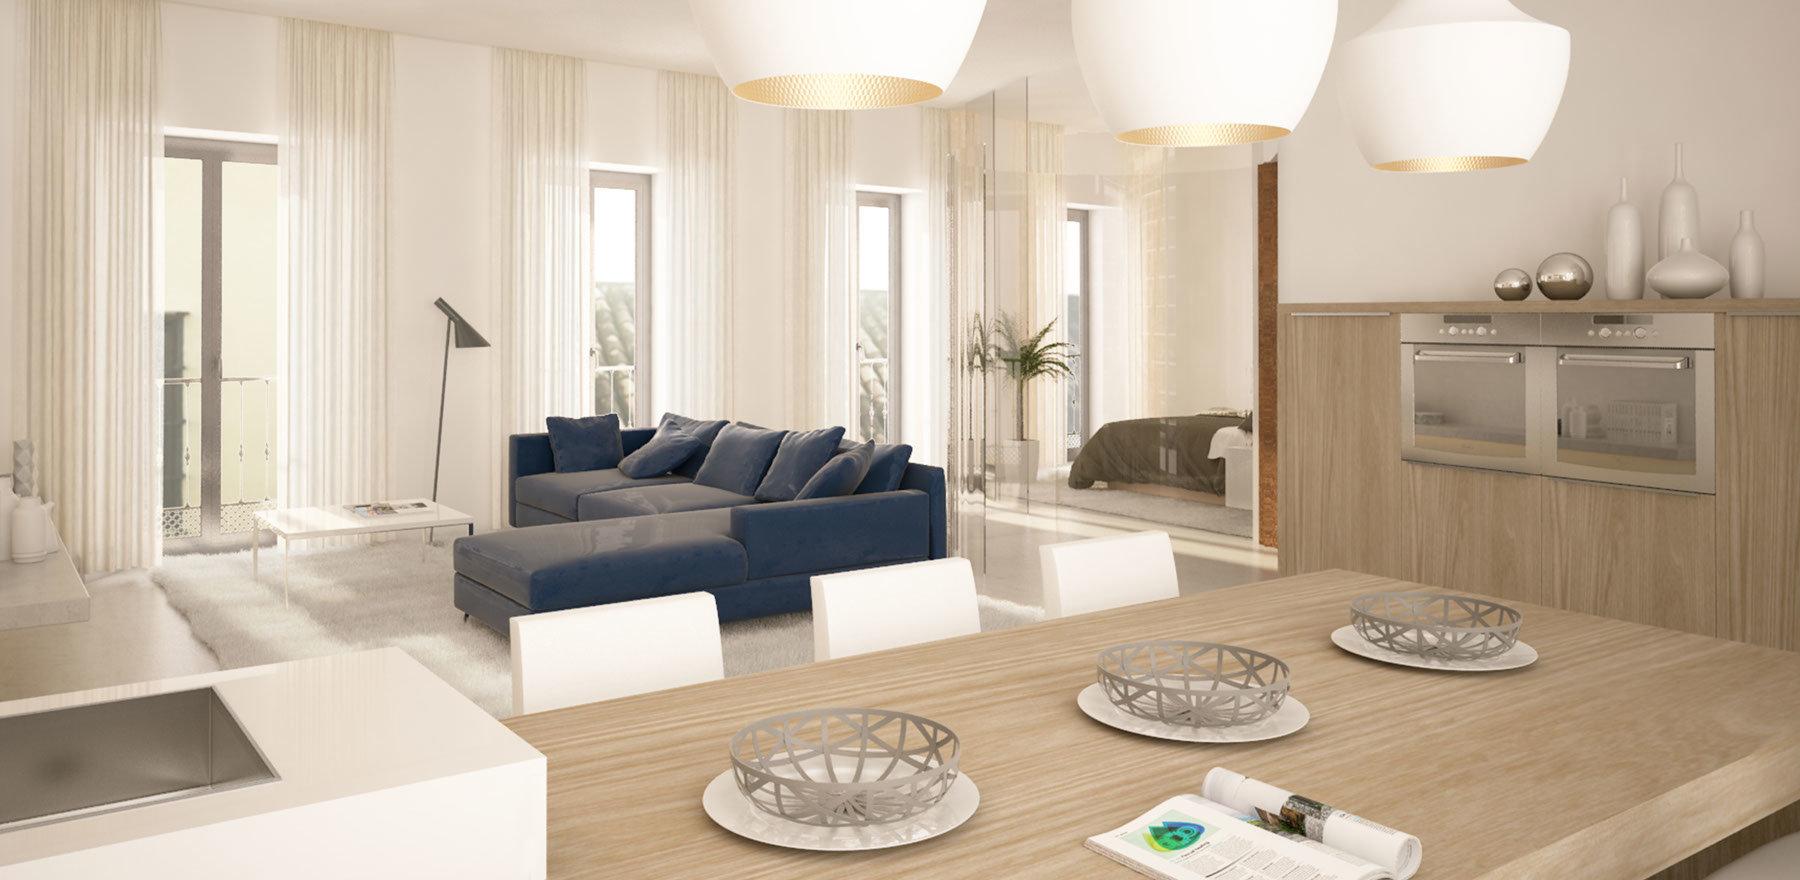 bathroom design center 3. 4 Bedroom, 3 Bathroom Penthouse For Sale In Malaga Center, Design Center P